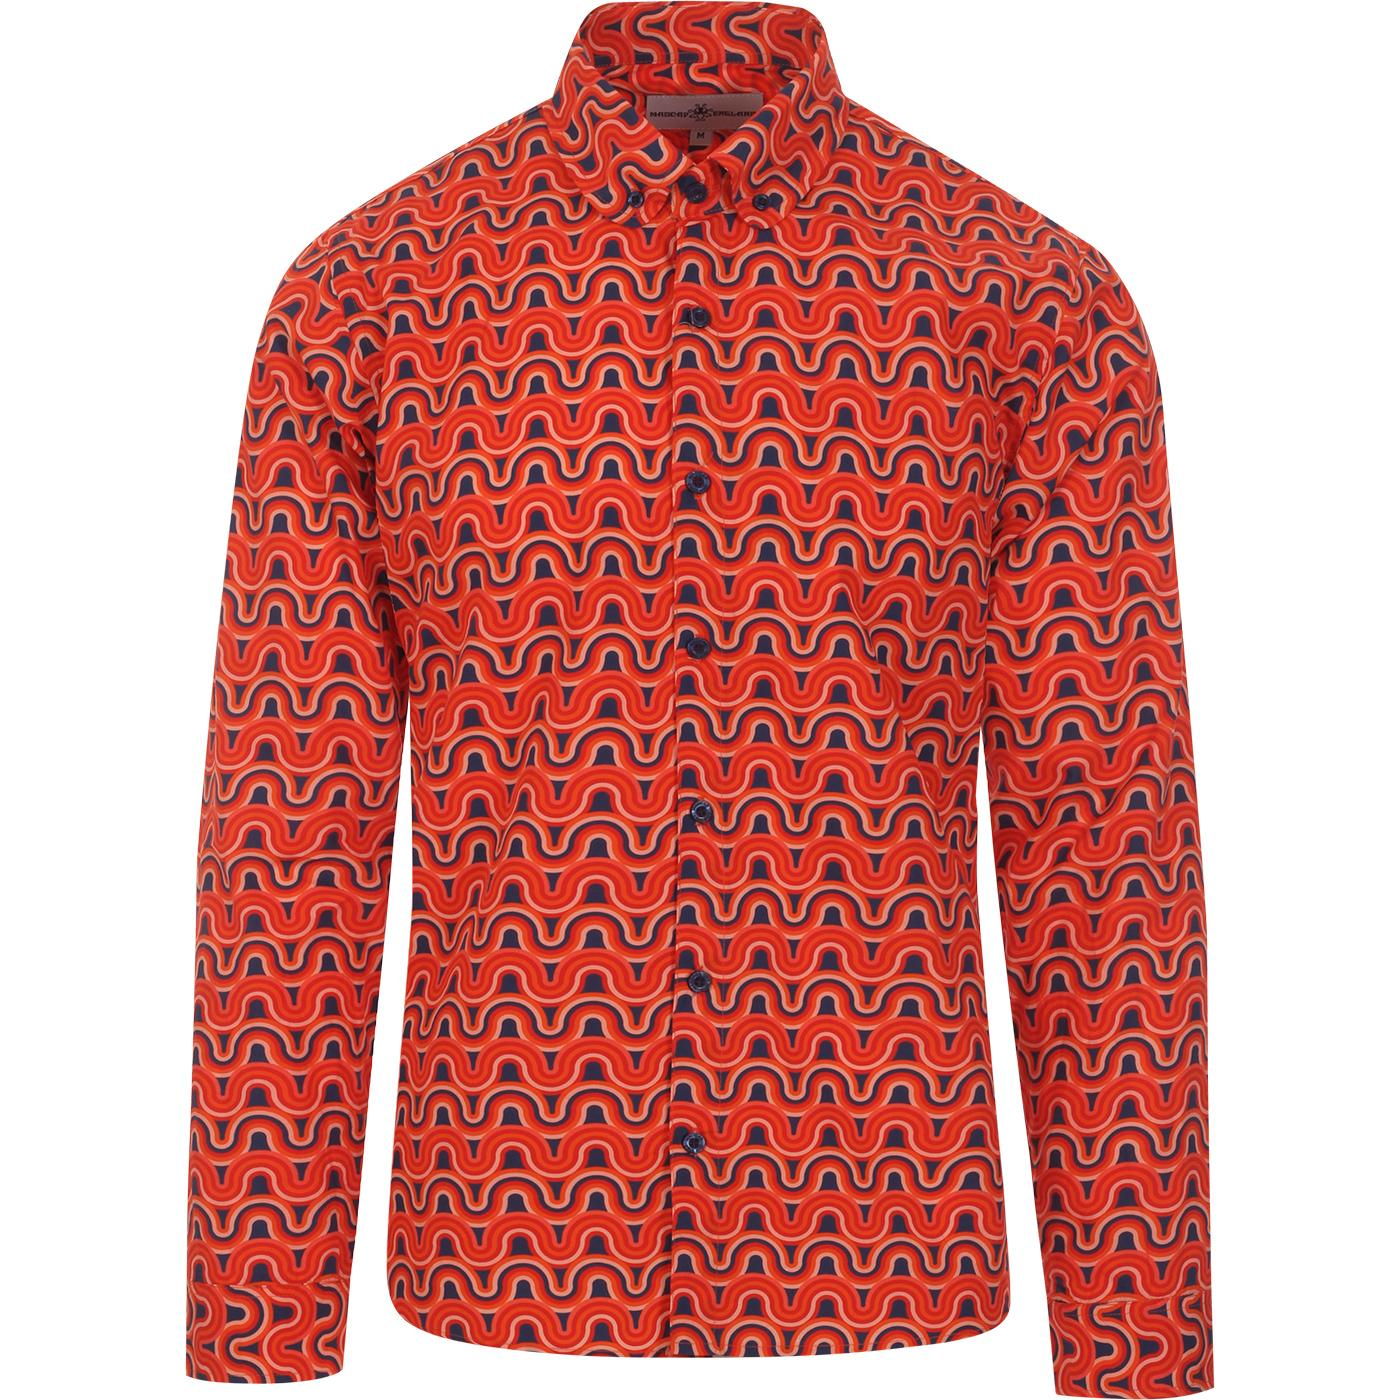 Kinfauns Rainbow MADCAP ENGLAND Penny Collar Shirt